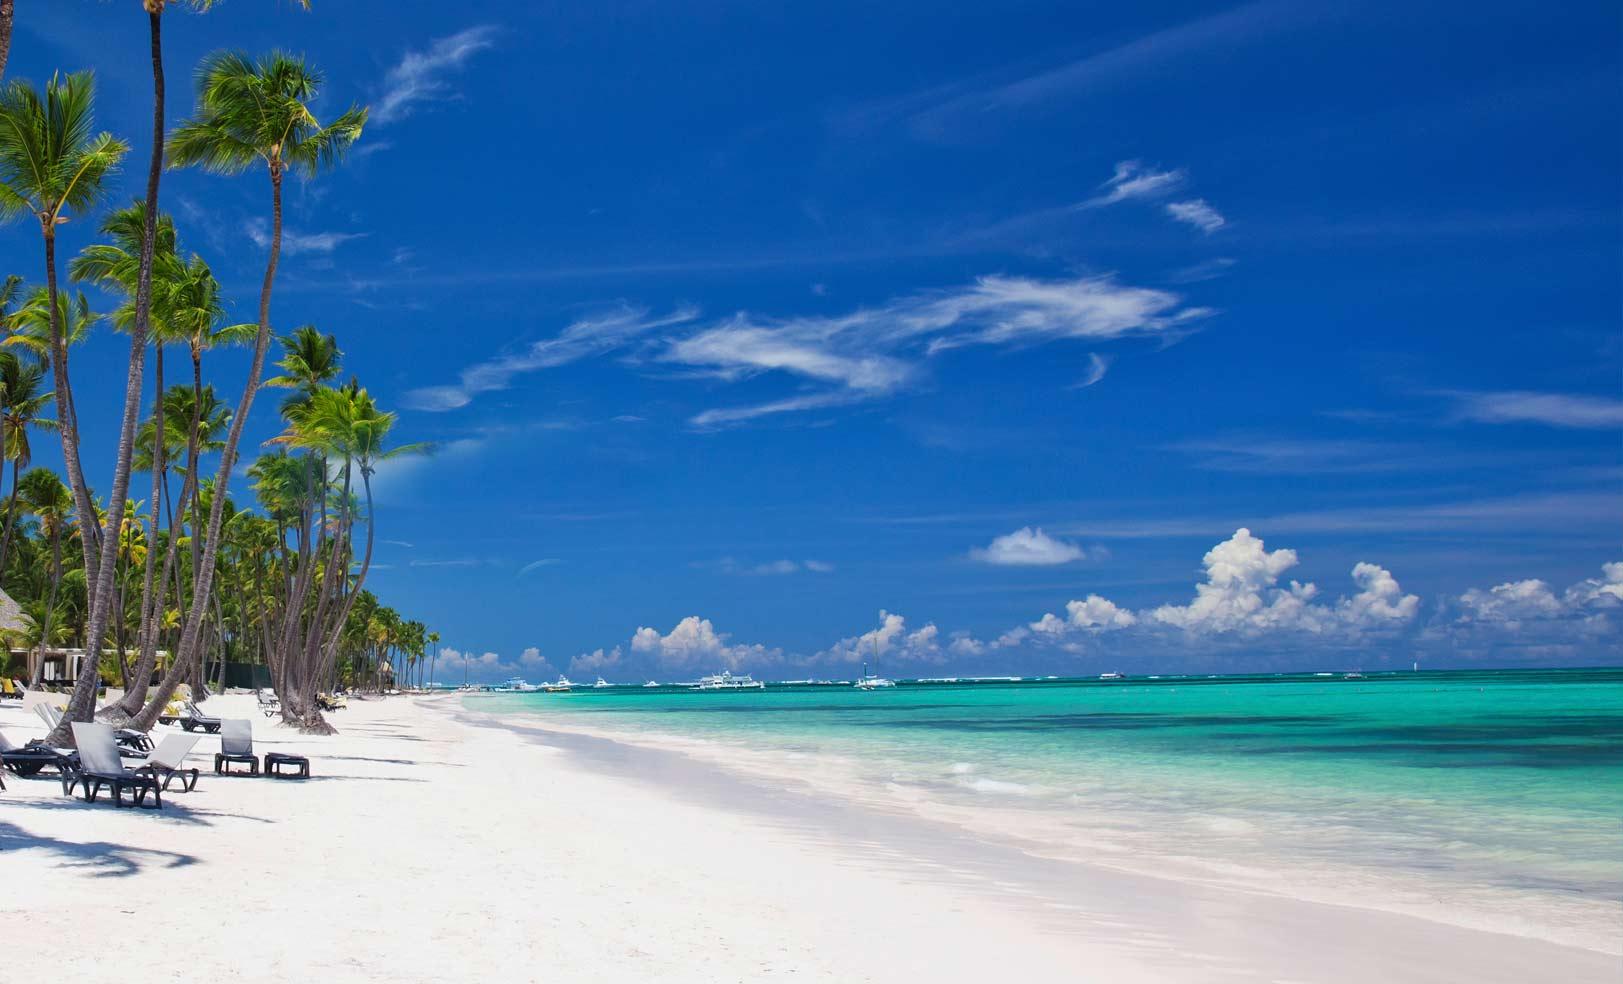 punta-cana-dominican-republic-destination-